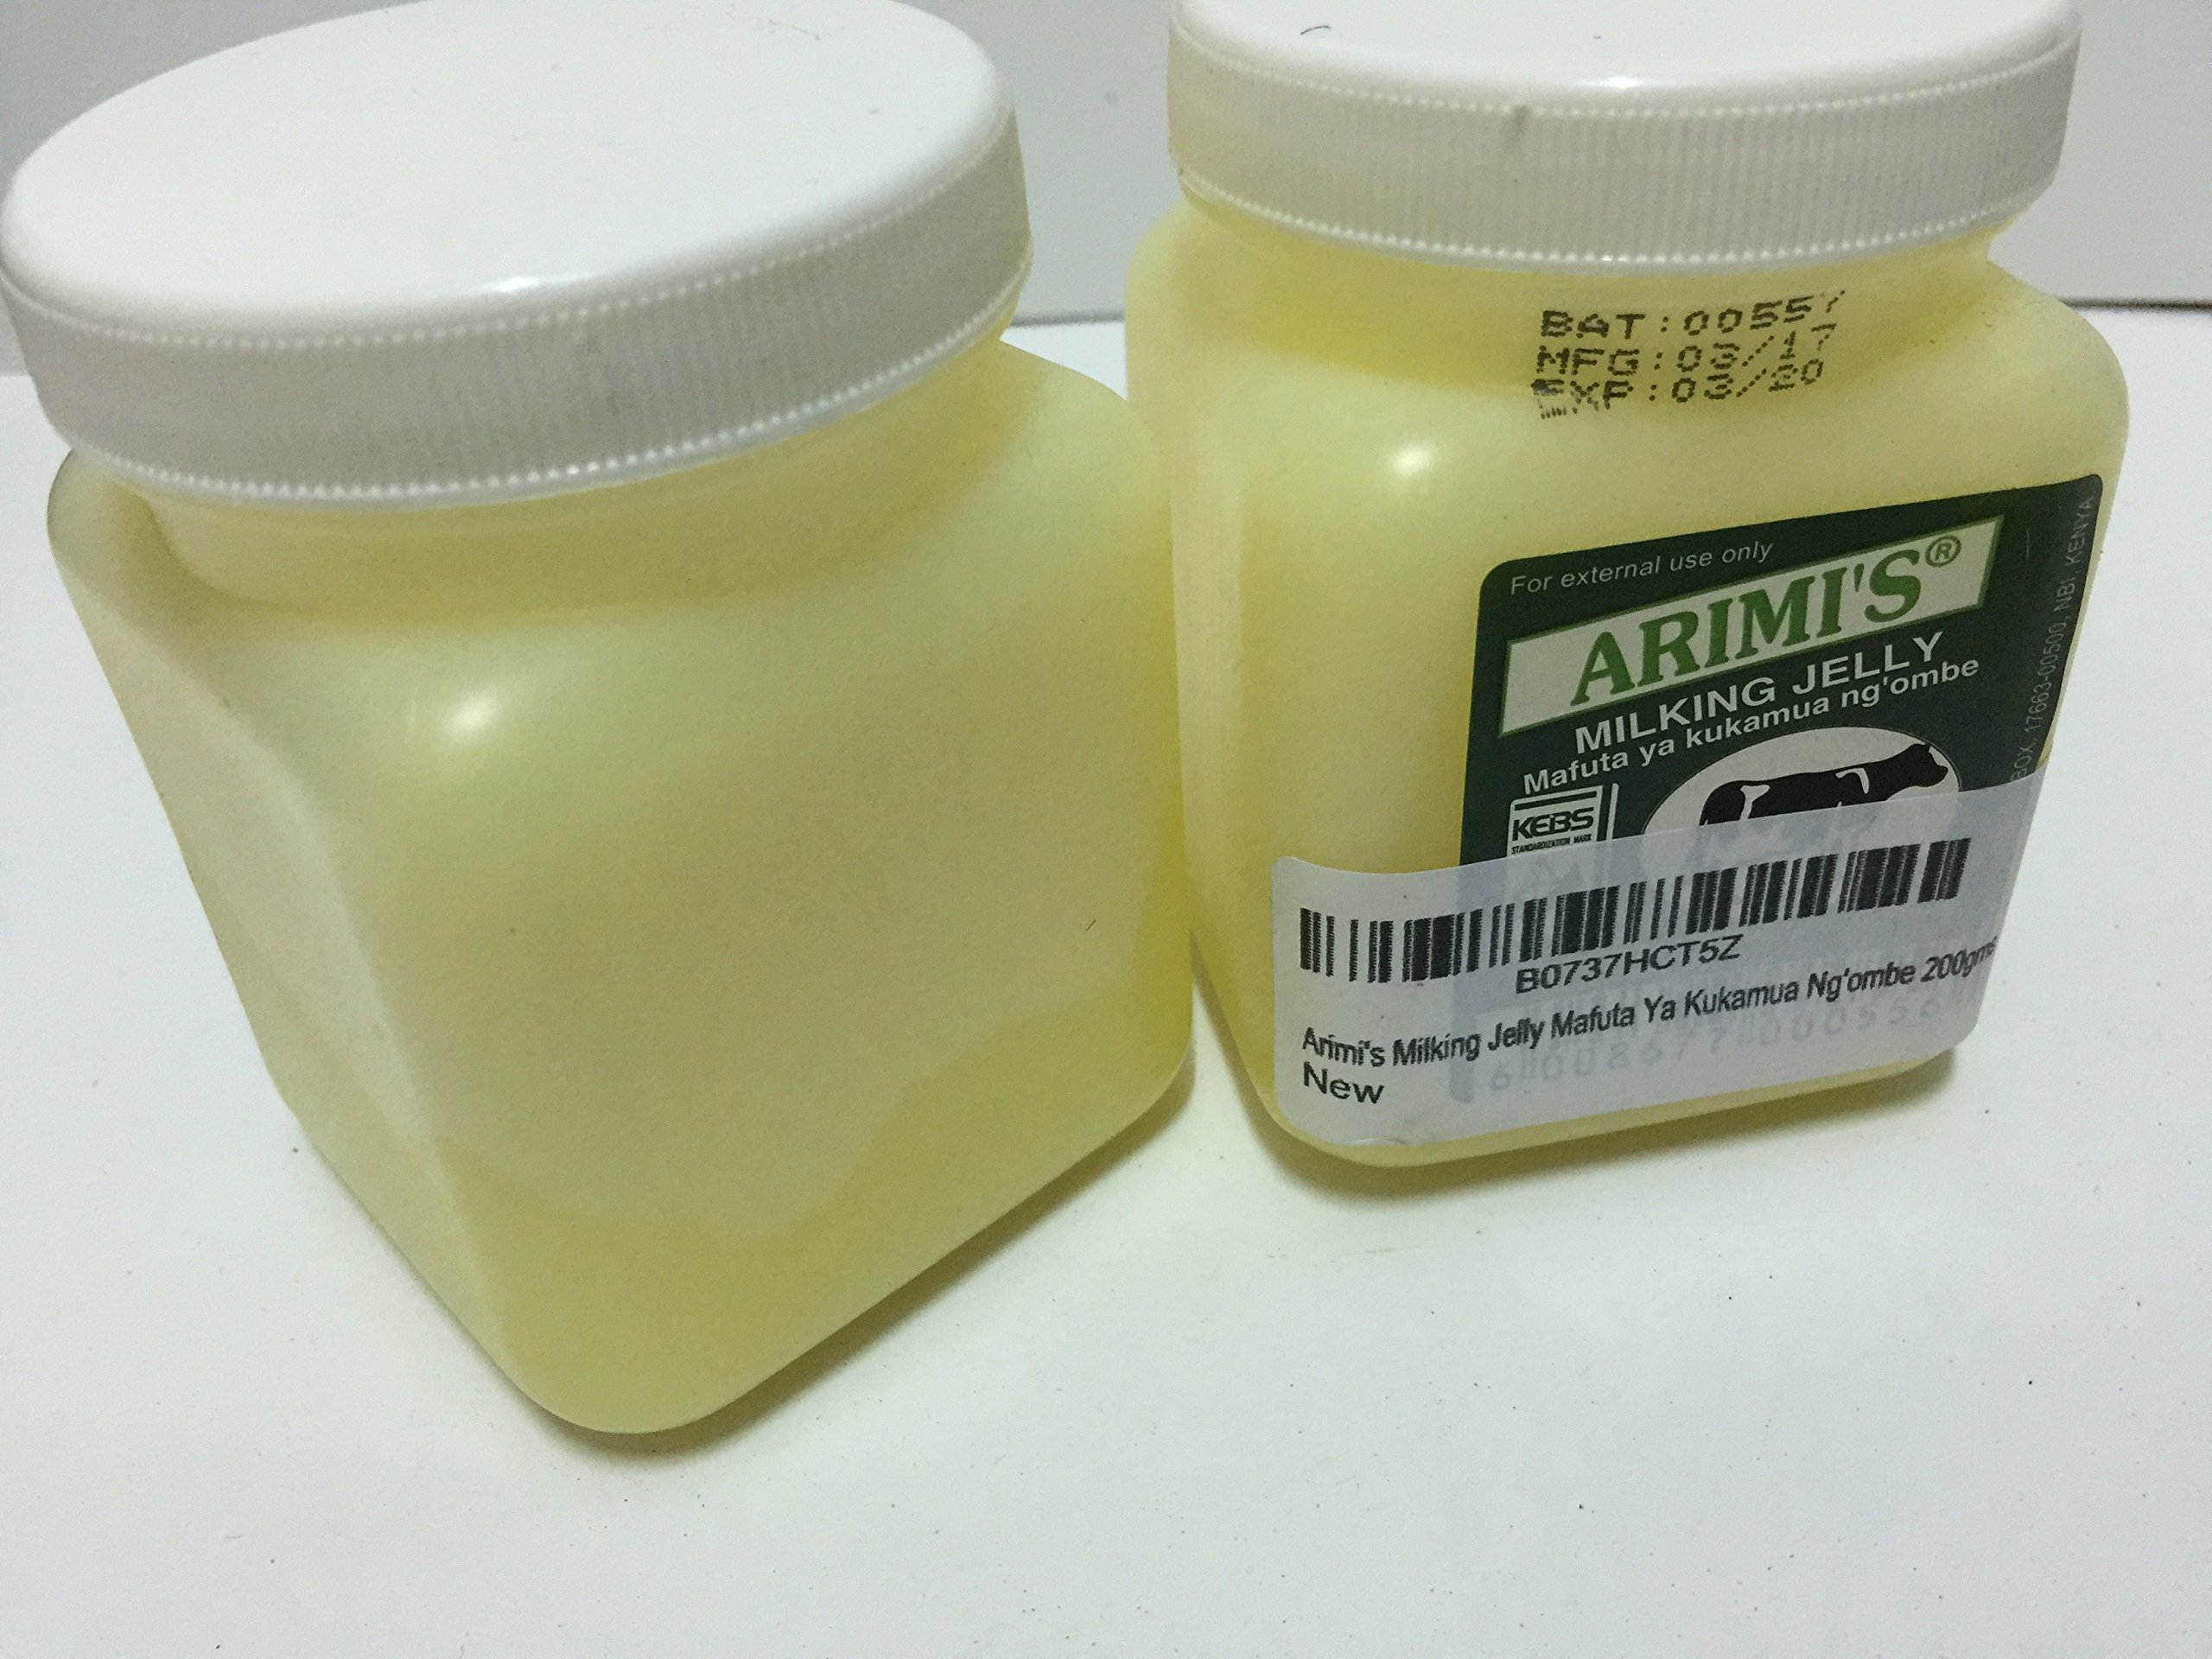 Arimi's Milking Jelly Mafuta Ya Kukamua Ng'ombe 200gms paired